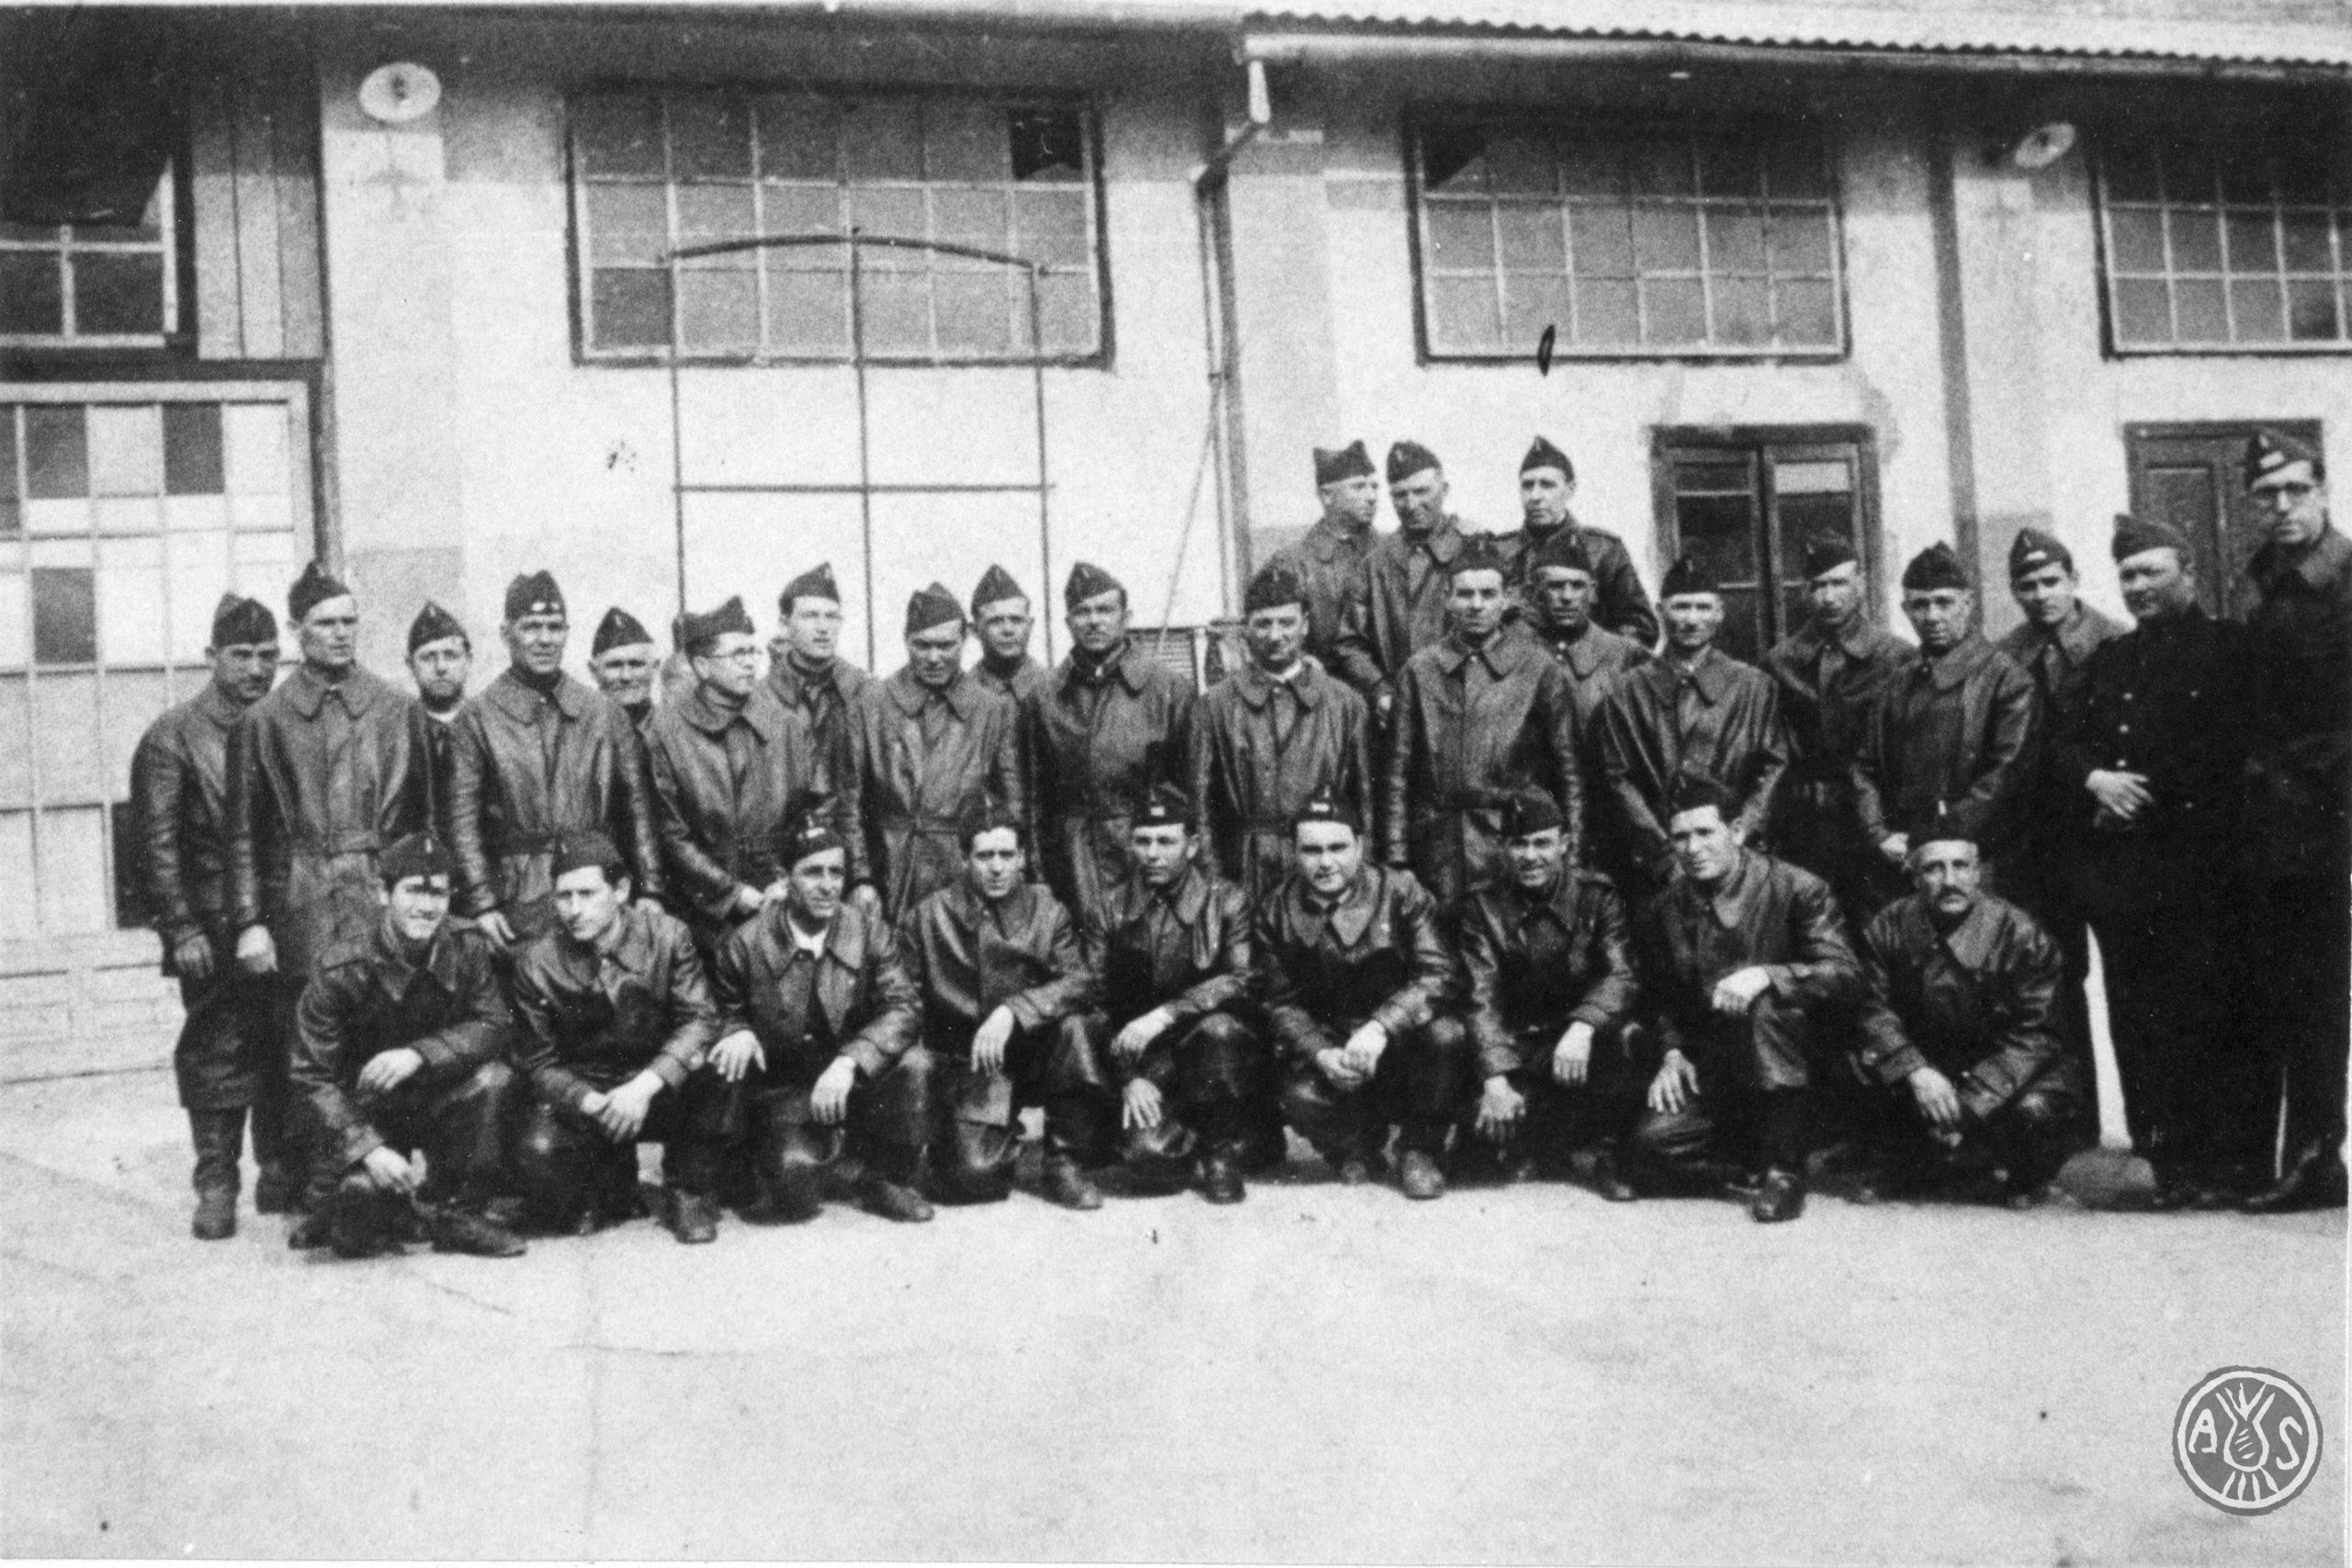 Bombers de Sabadell el 1937